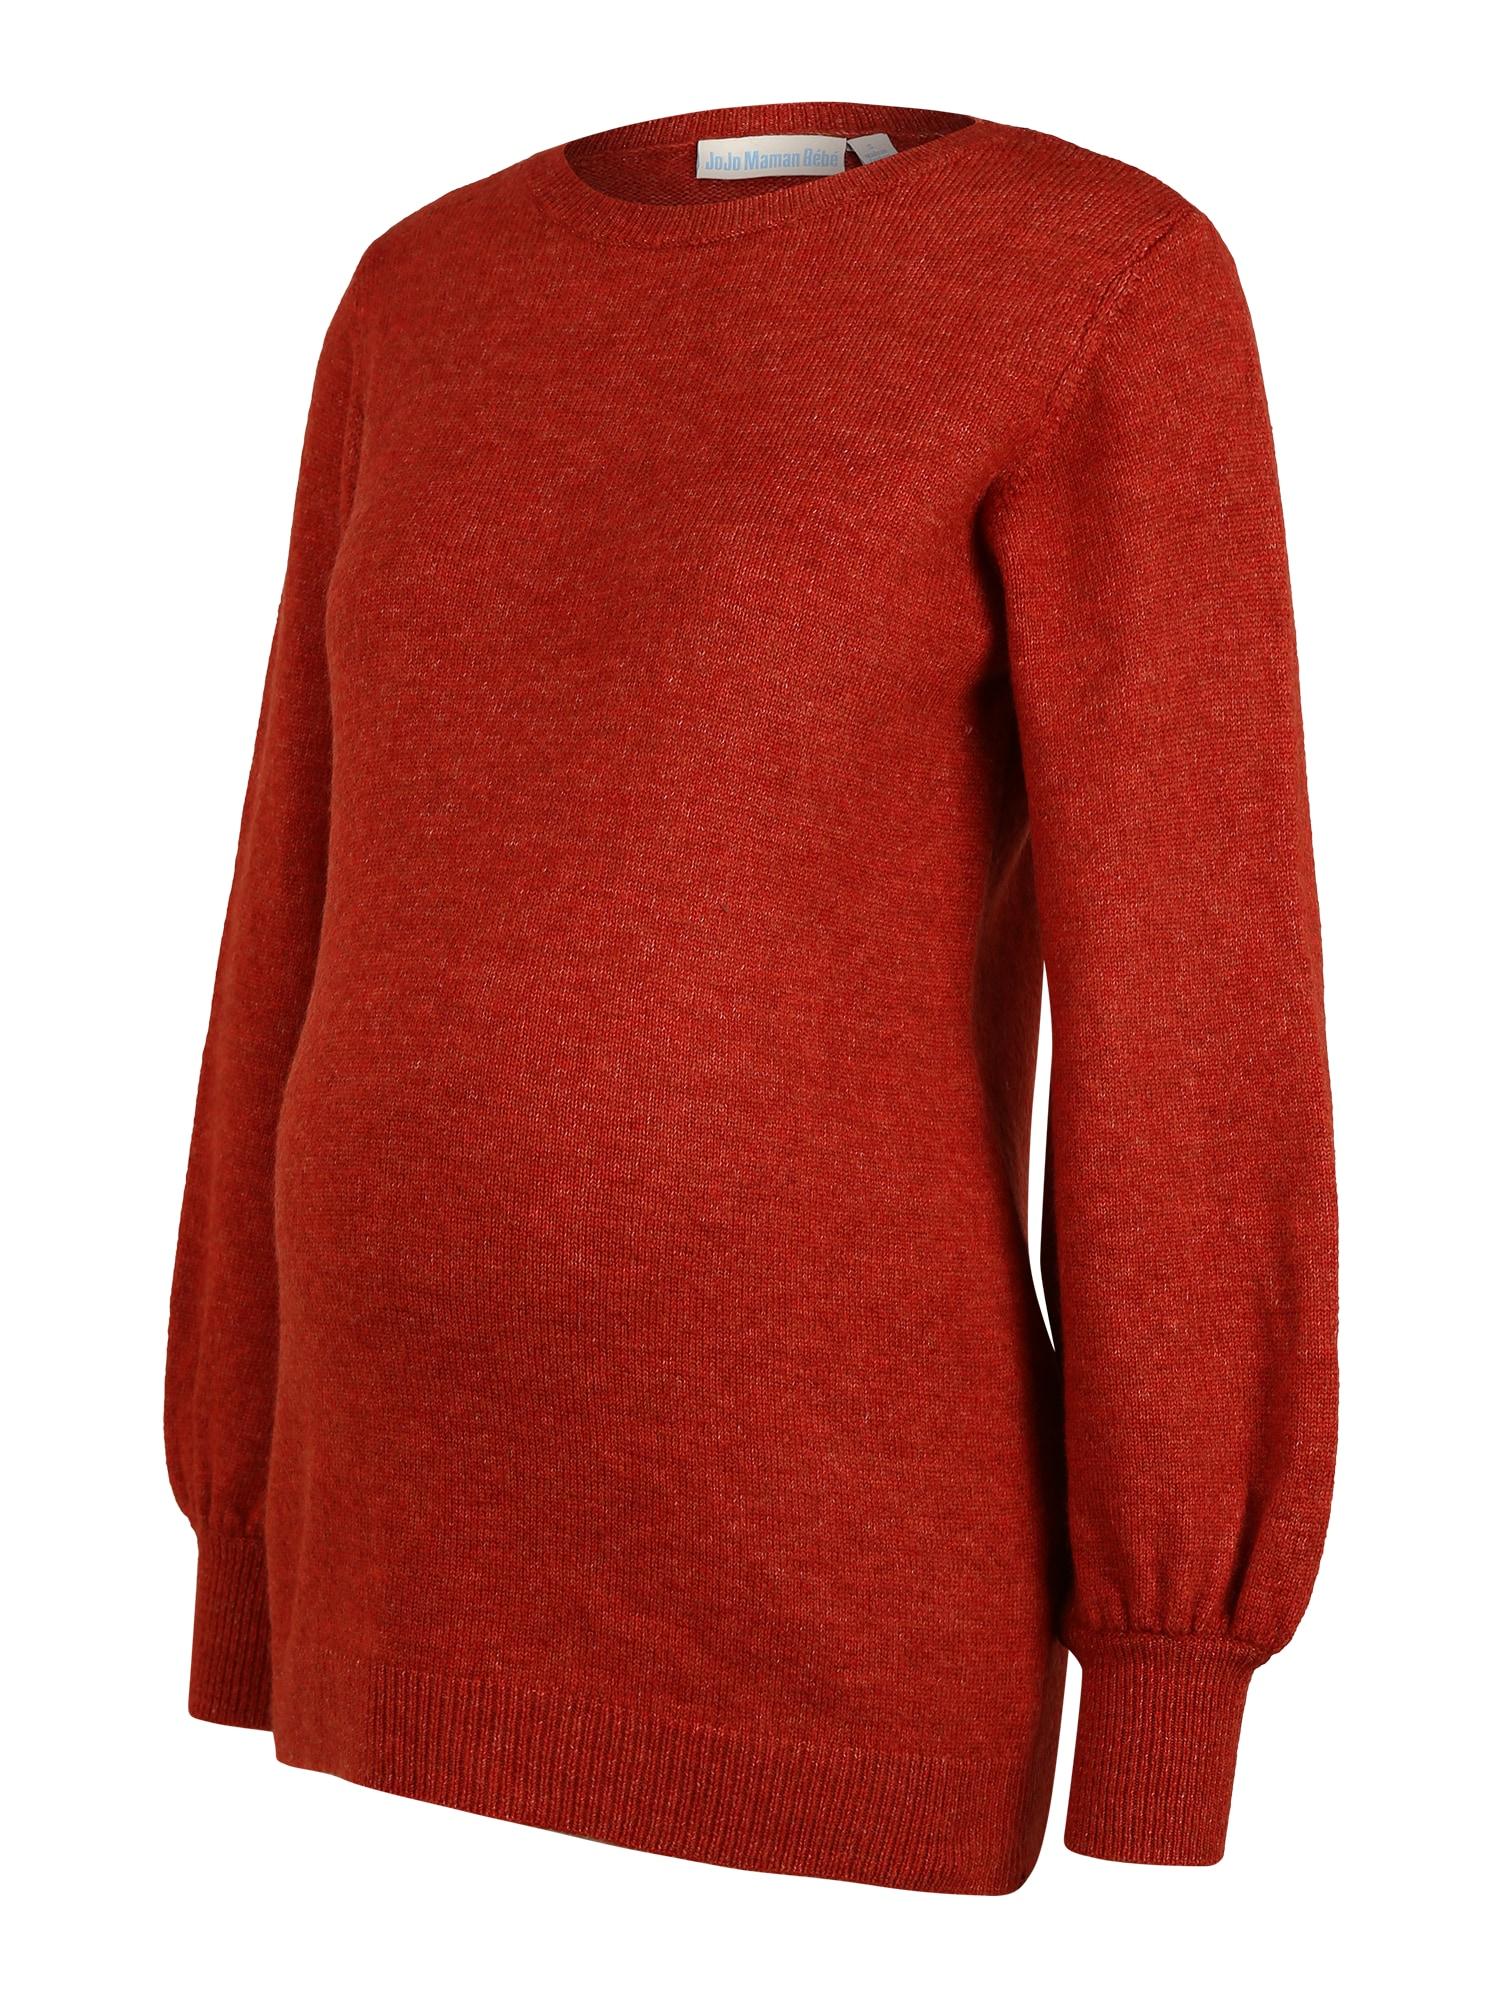 JoJo Maman Bébé Megztinis rūdžių raudona